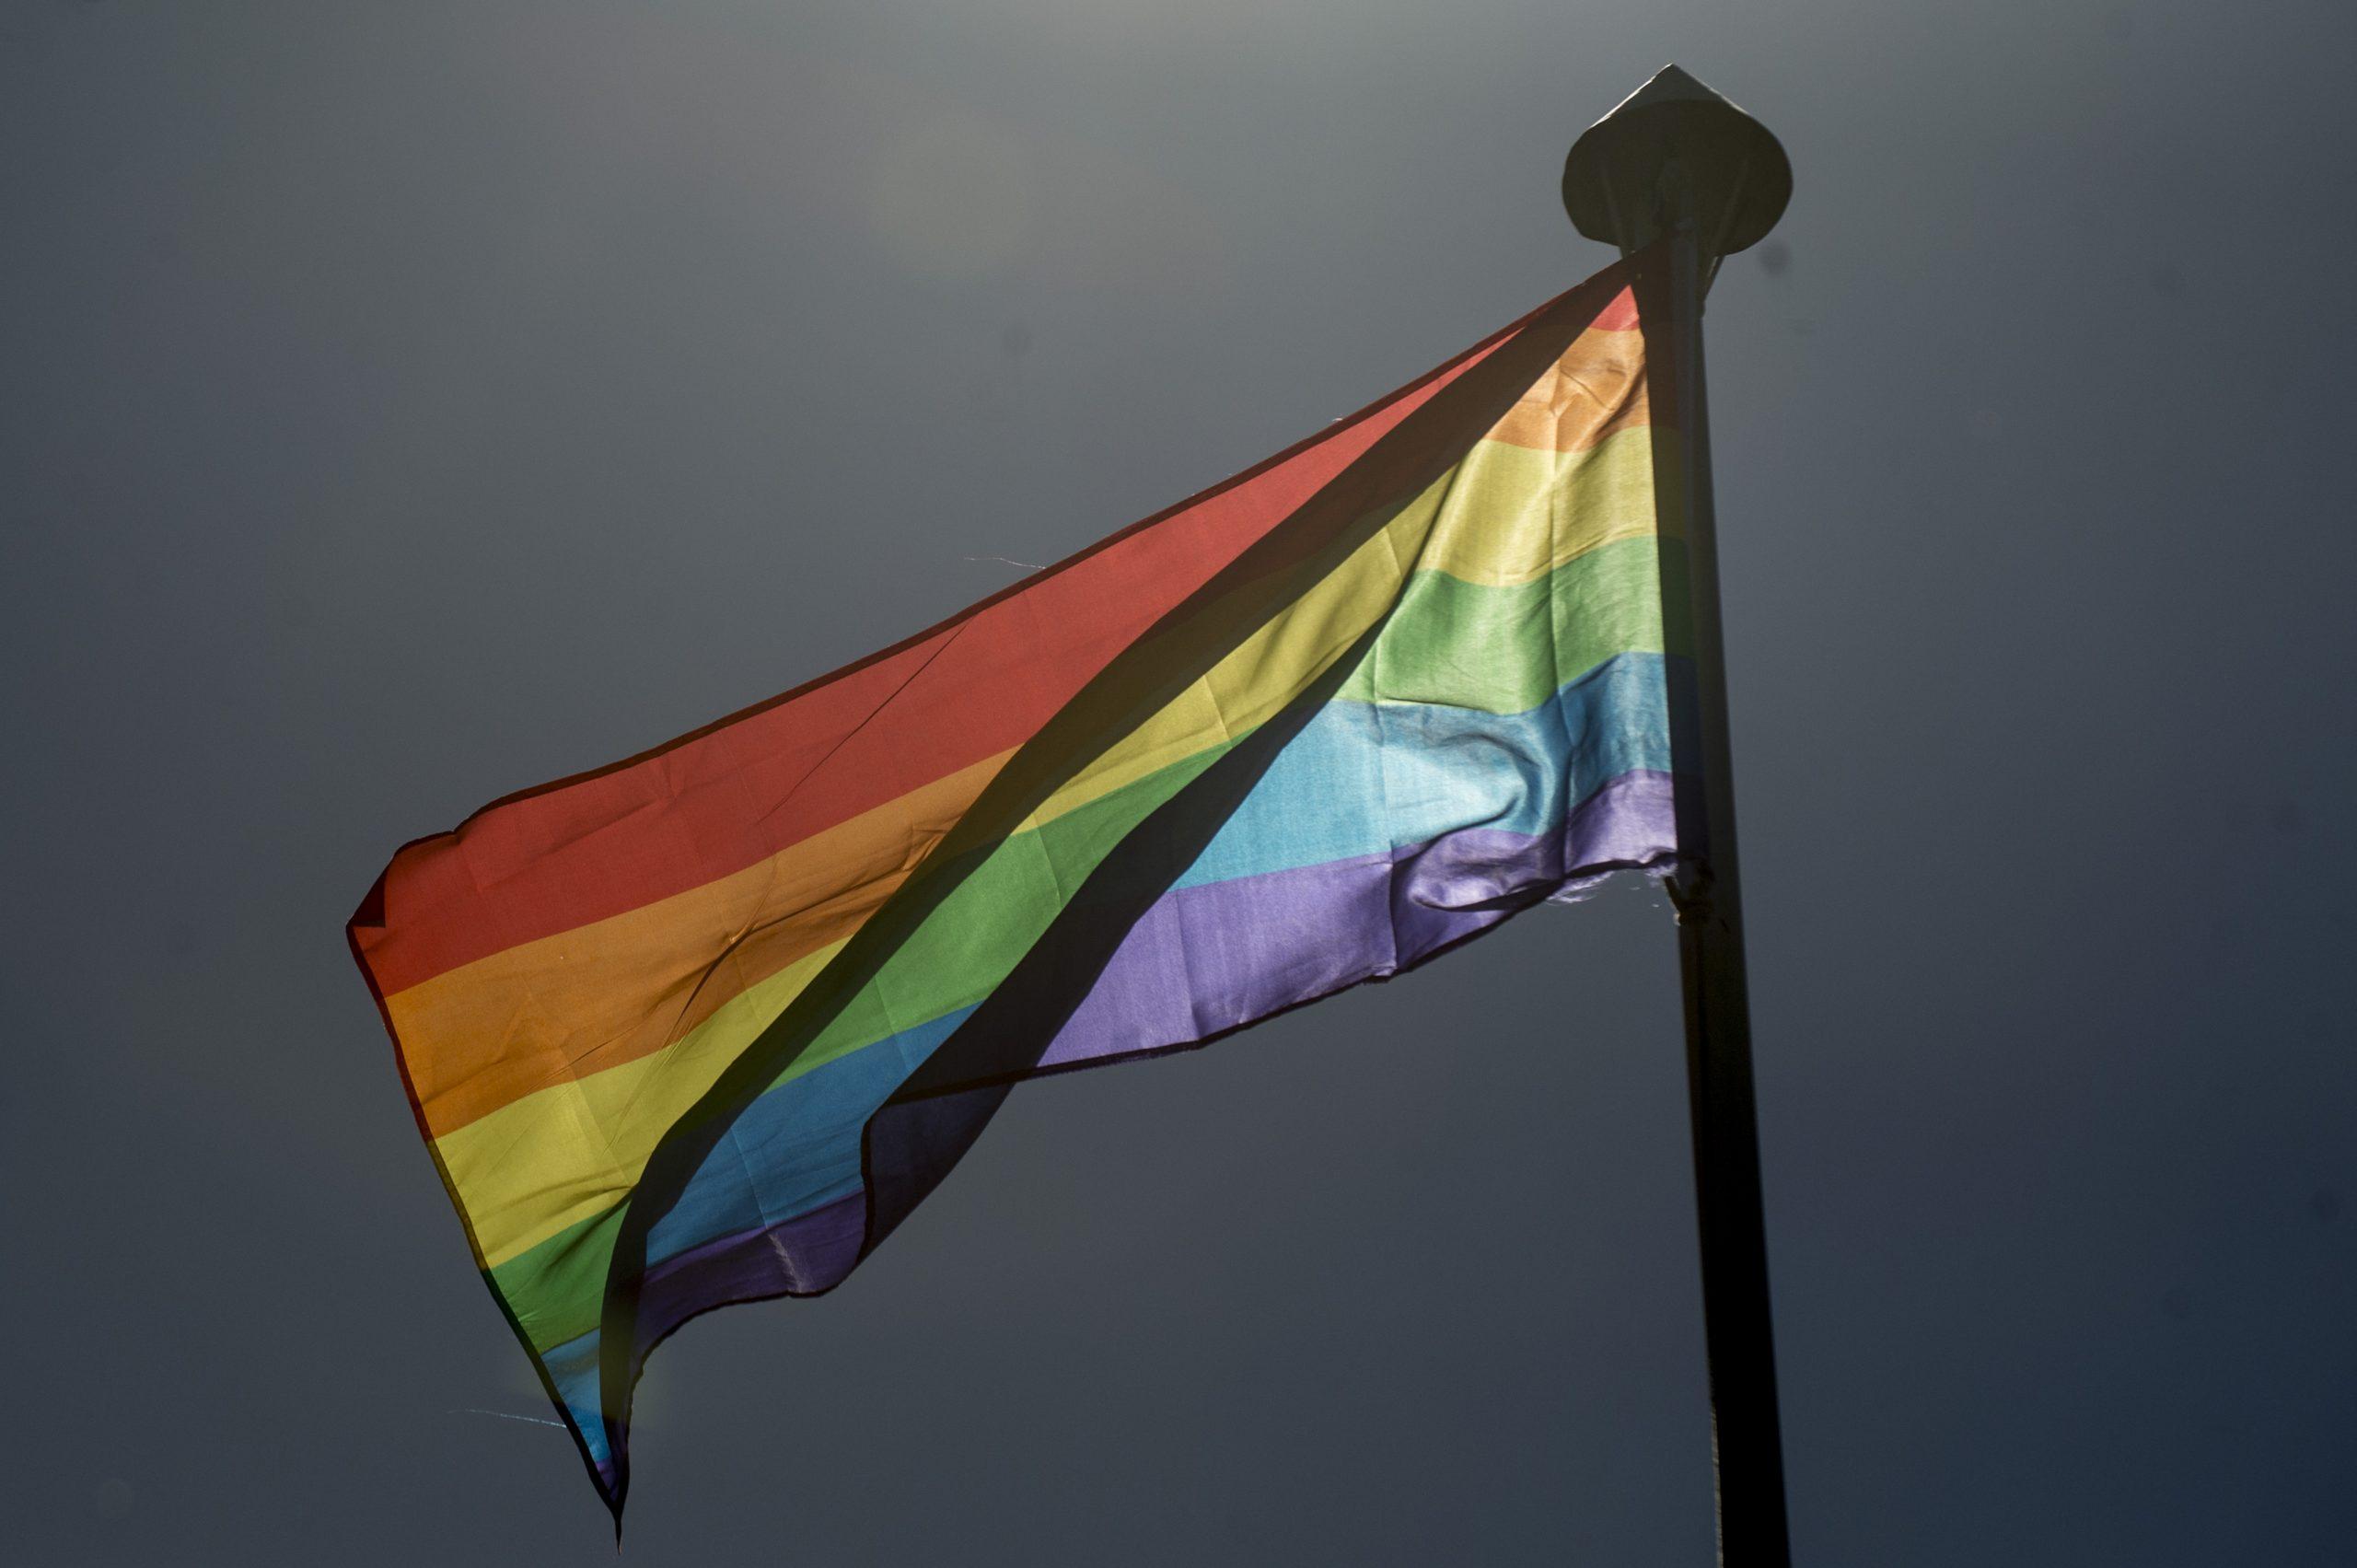 Vereadora de Natal promove políticas públicas para causa LGBT